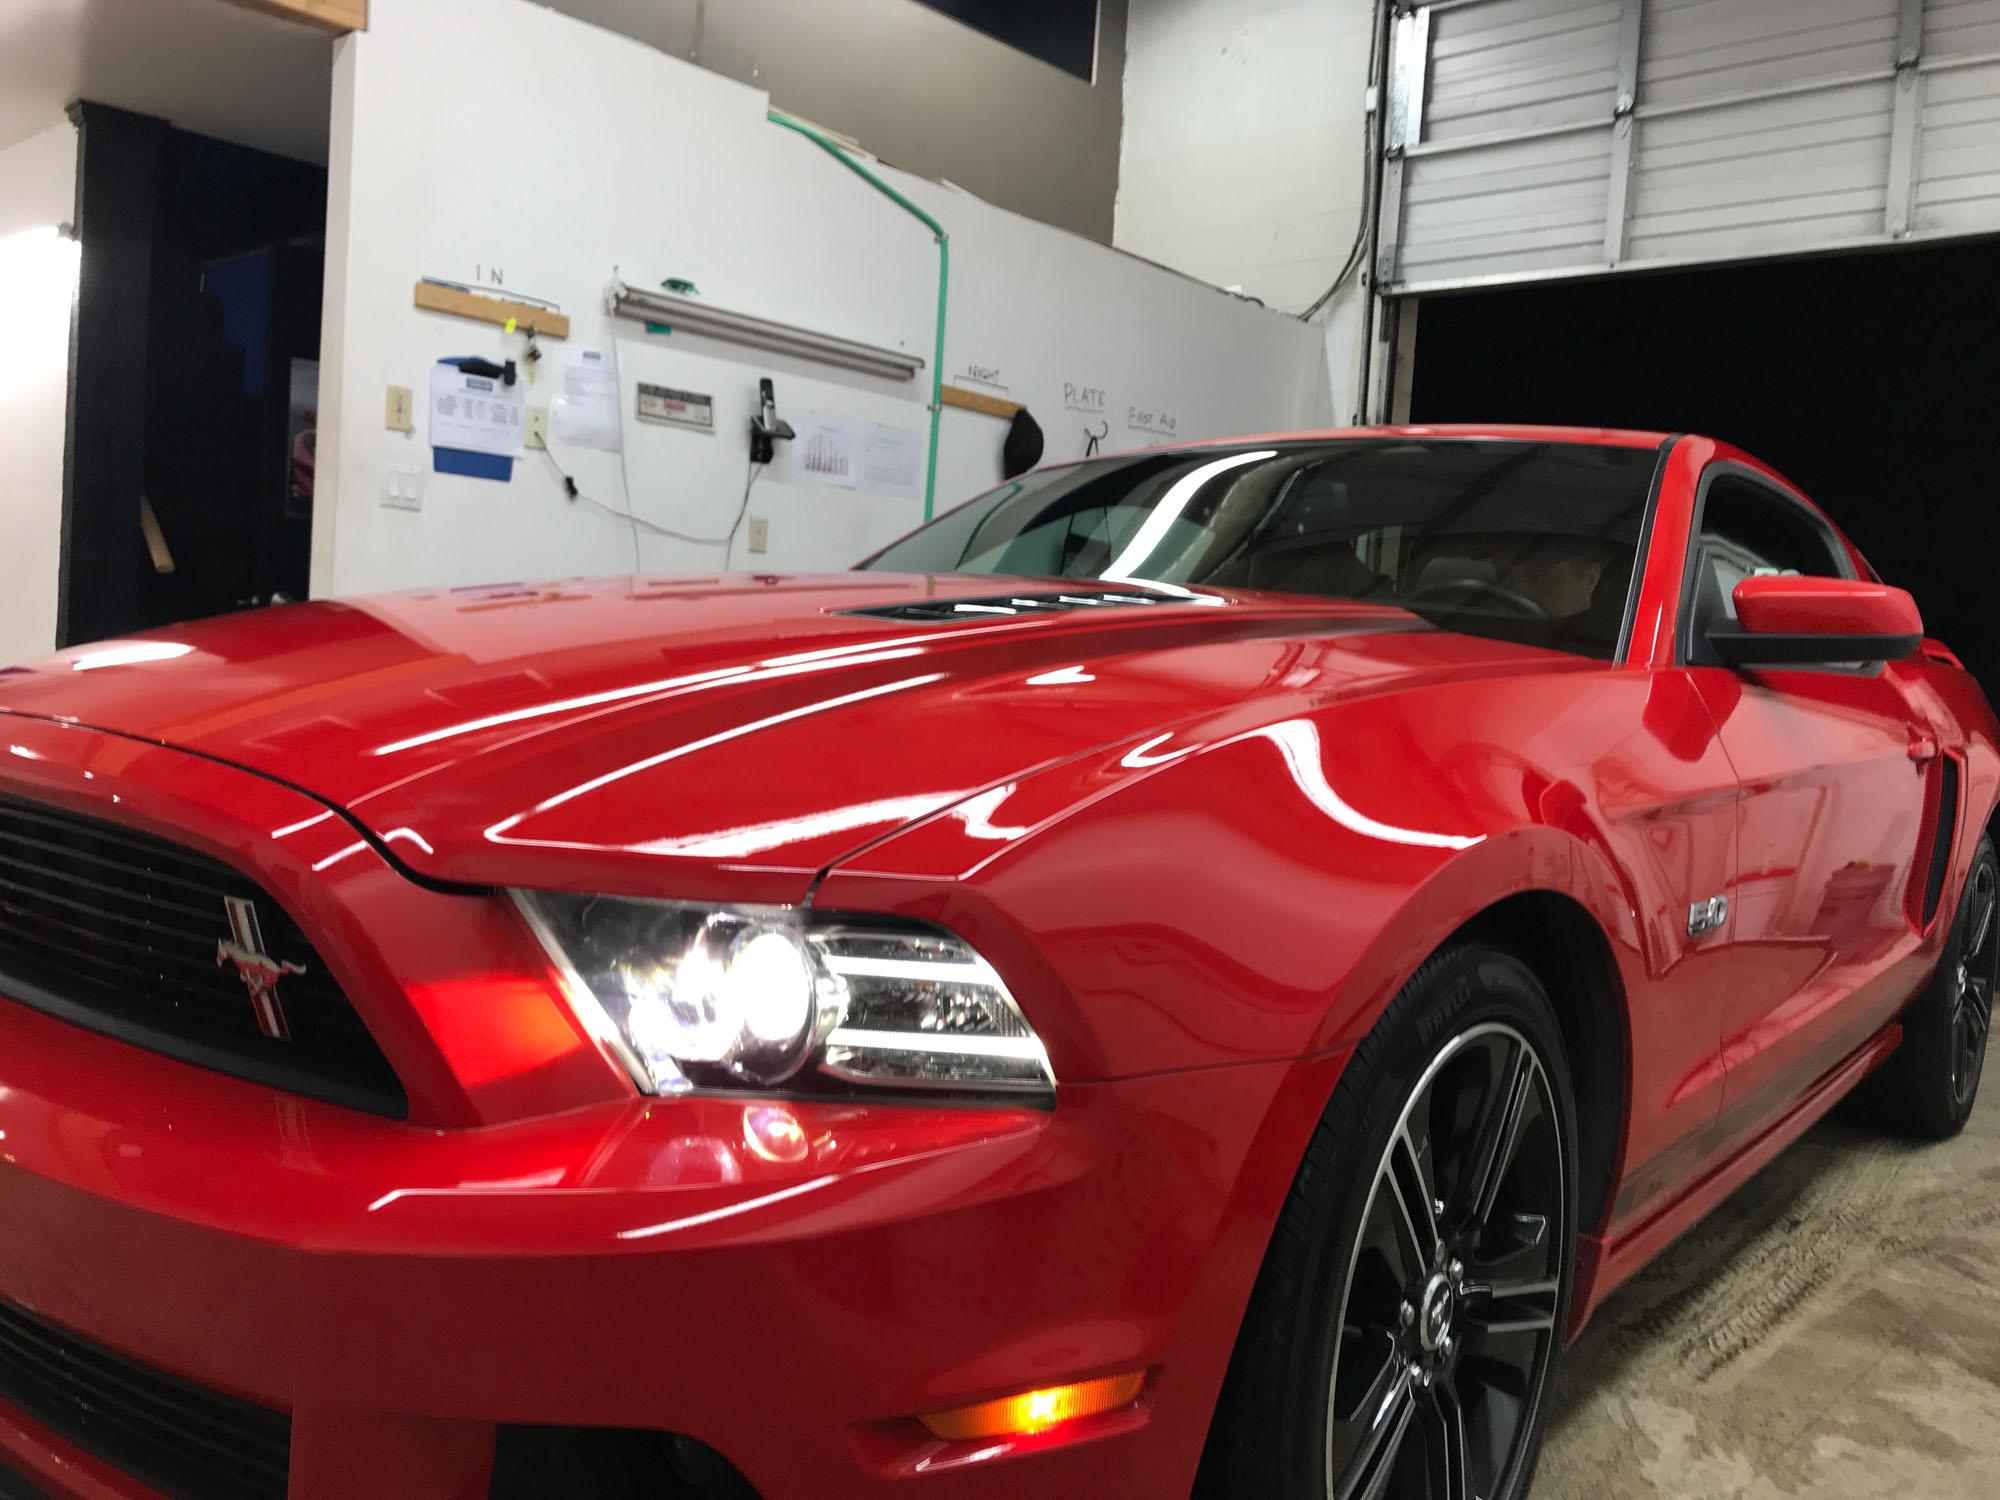 Mustang Feb 01 2018  (6) - Copy.jpg